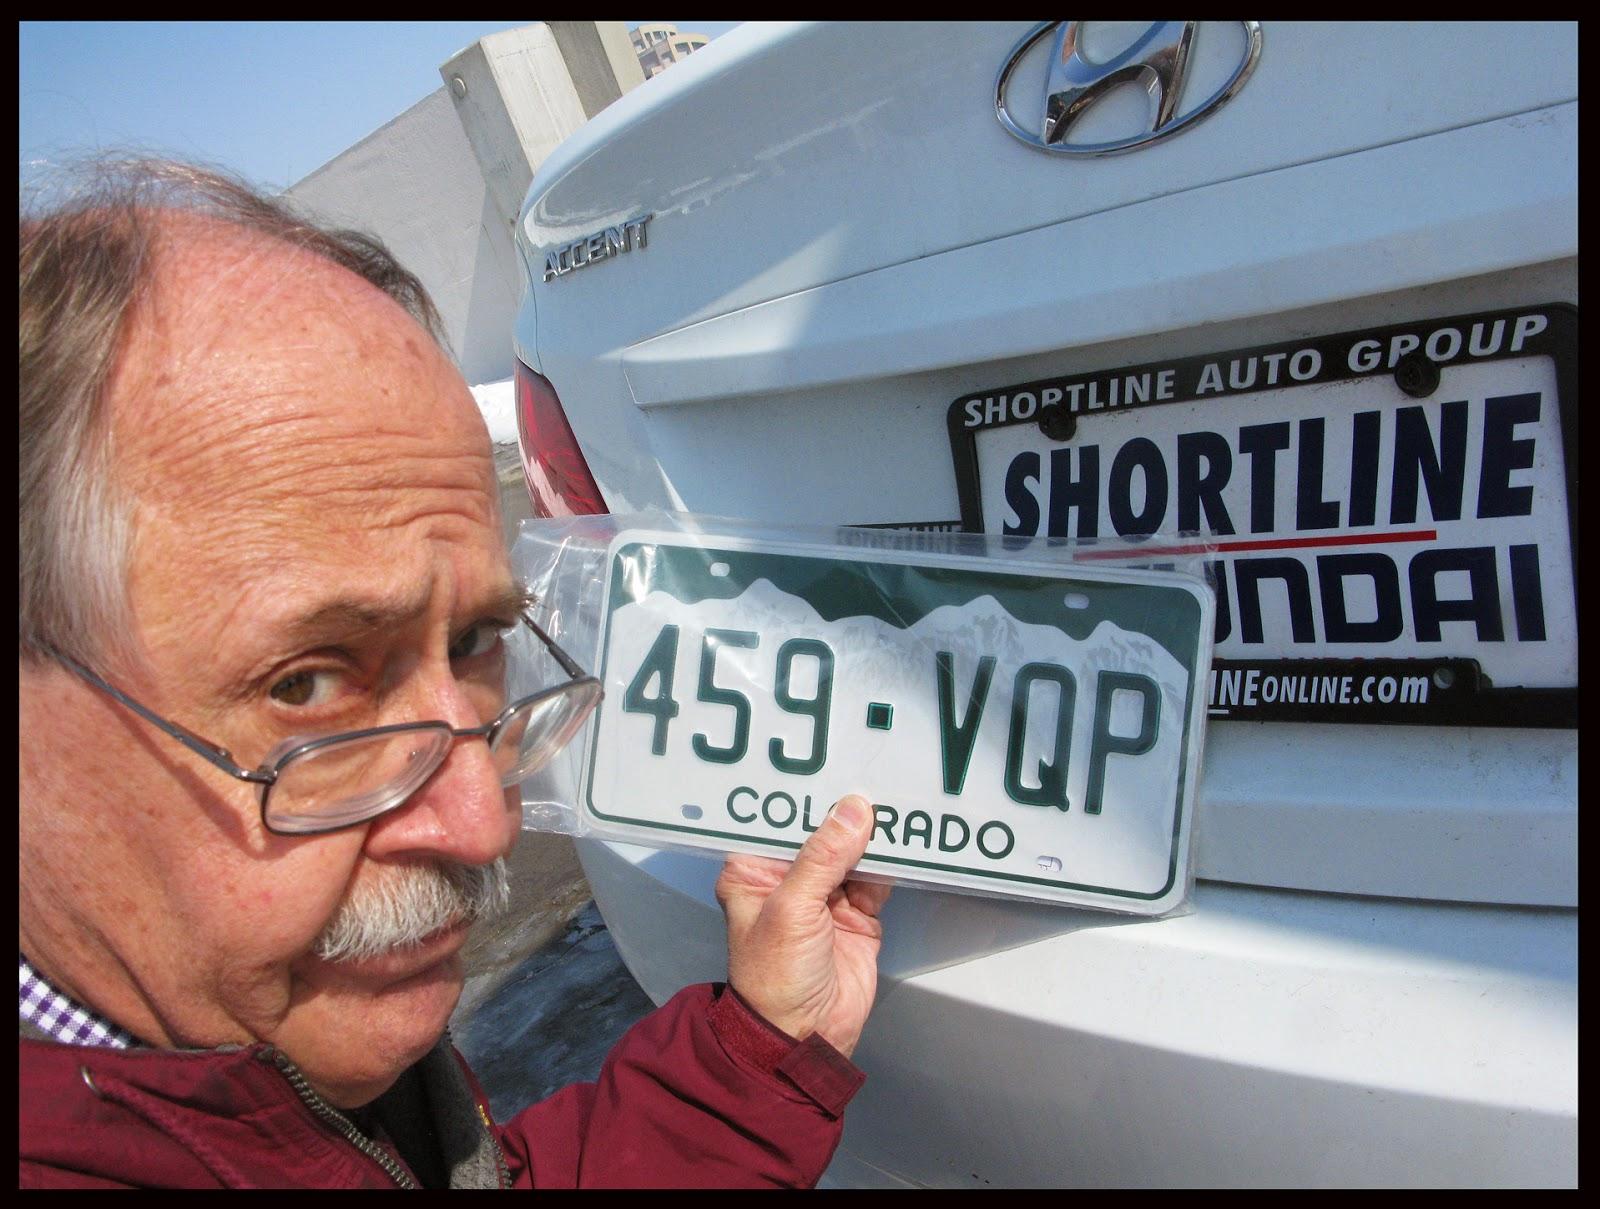 David Hoyt's Blog: The Heartbreak Of Purchasing Colorado License Plates